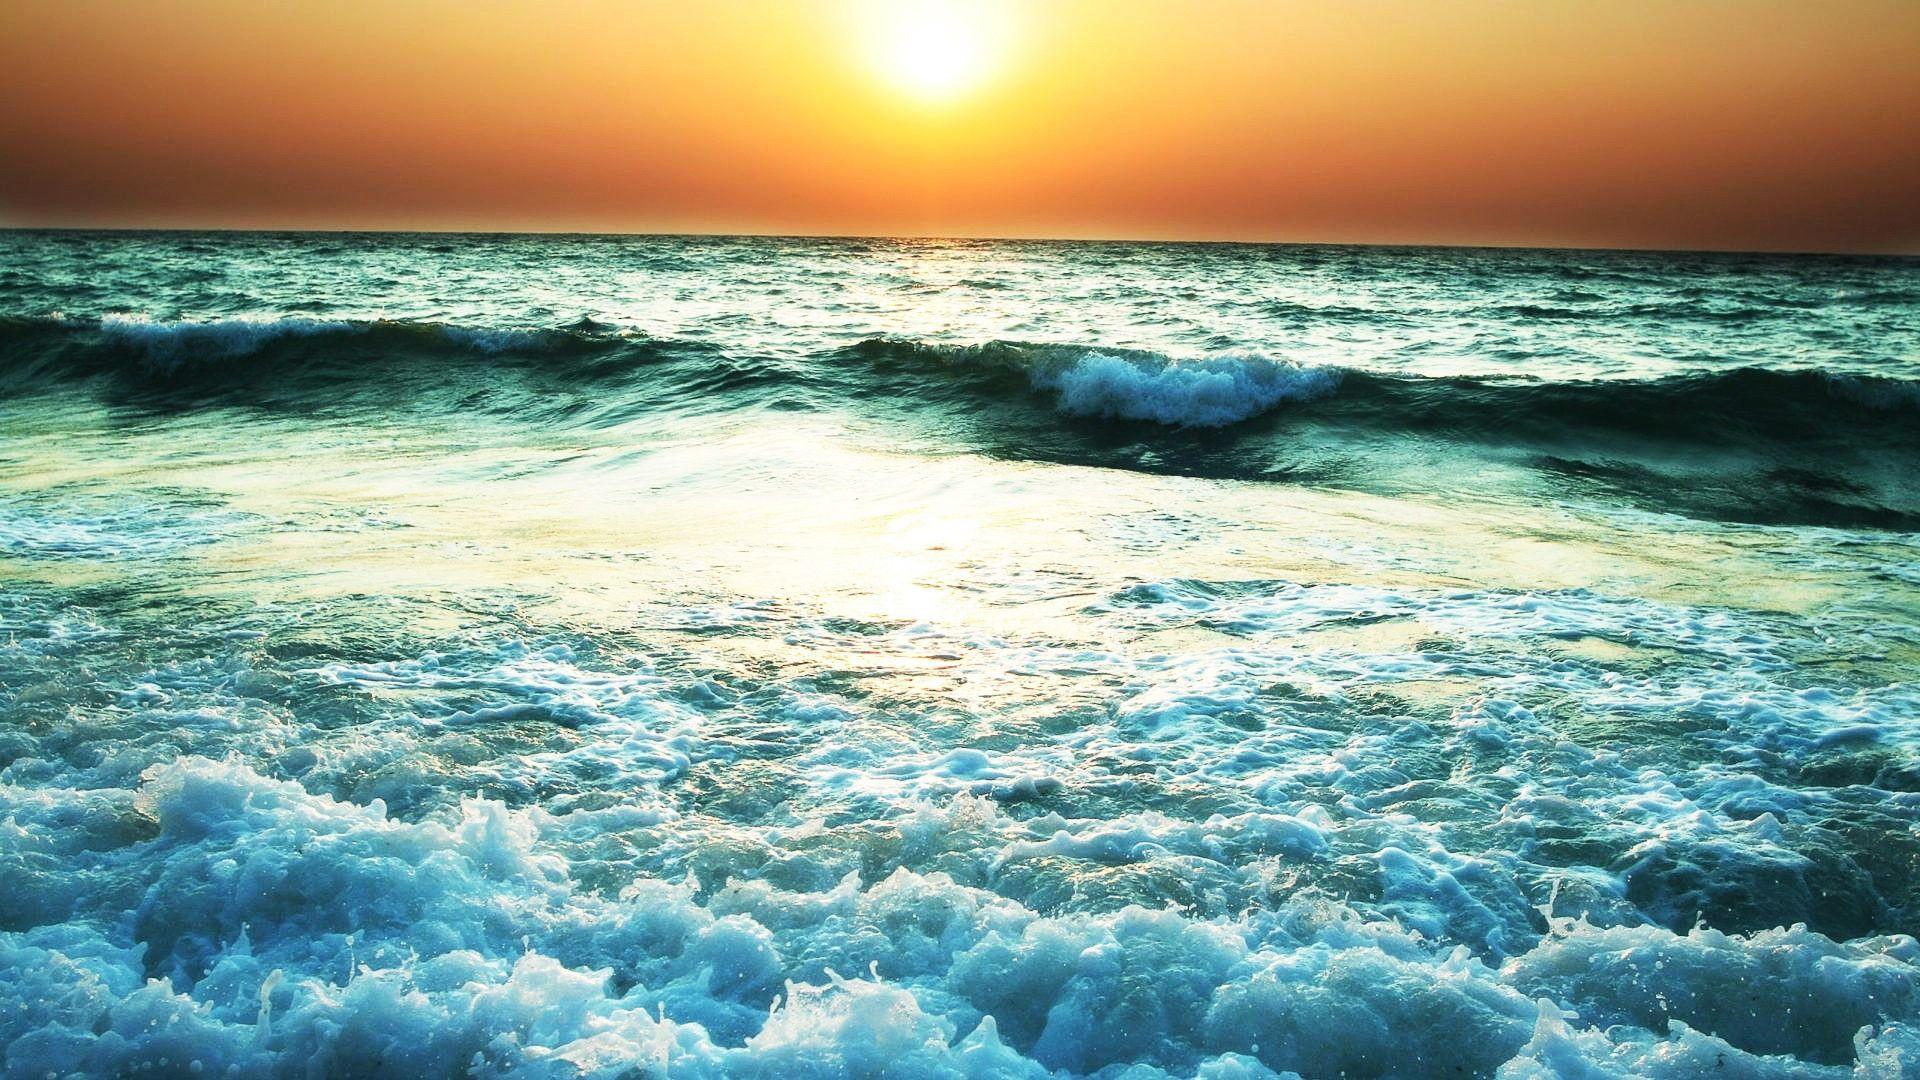 Ocean Themed HD Download